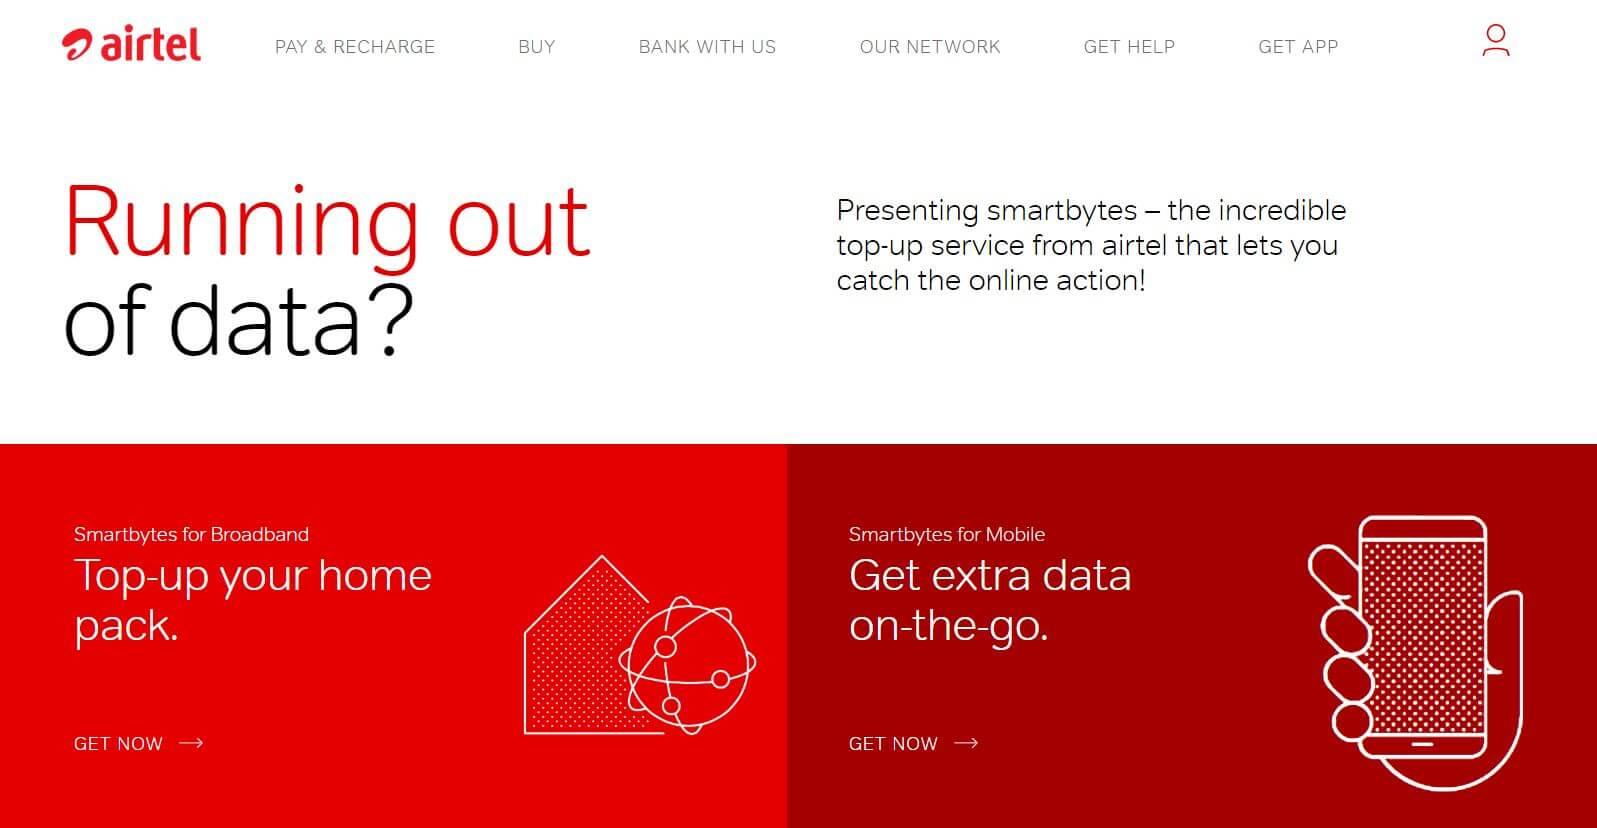 Airtel-smartbytes